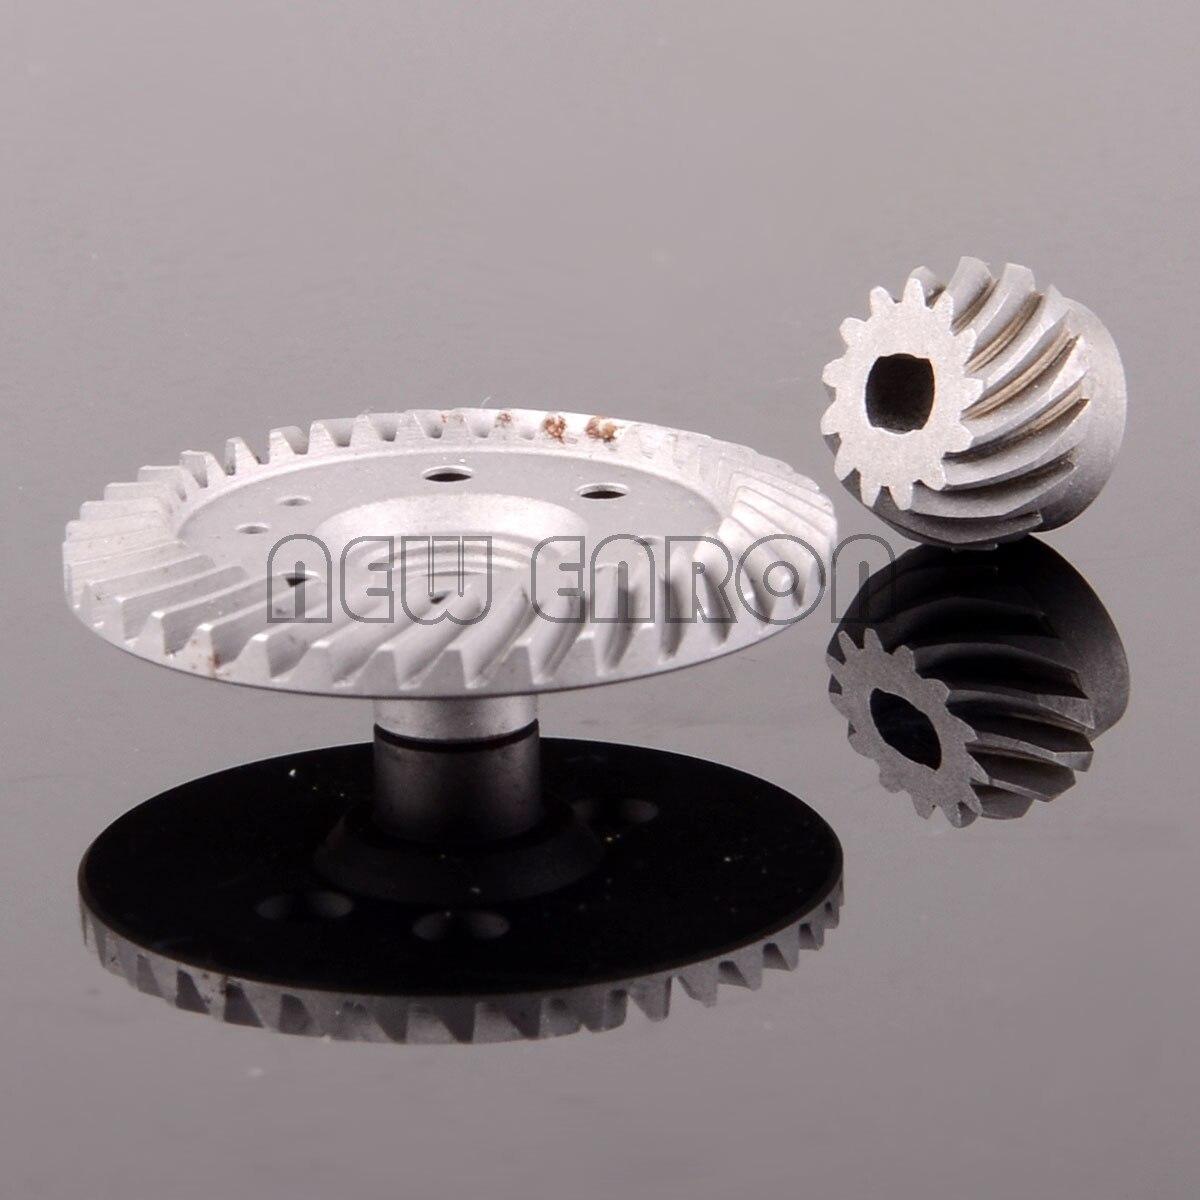 Nuevo ENRON, 2 uds., anillo diferencial de acero duro 37T/13T/engranaje de piñón #6879 para RC Traxxas 1/10 Slash 4x4, sello 4X4 Rustler XO-1